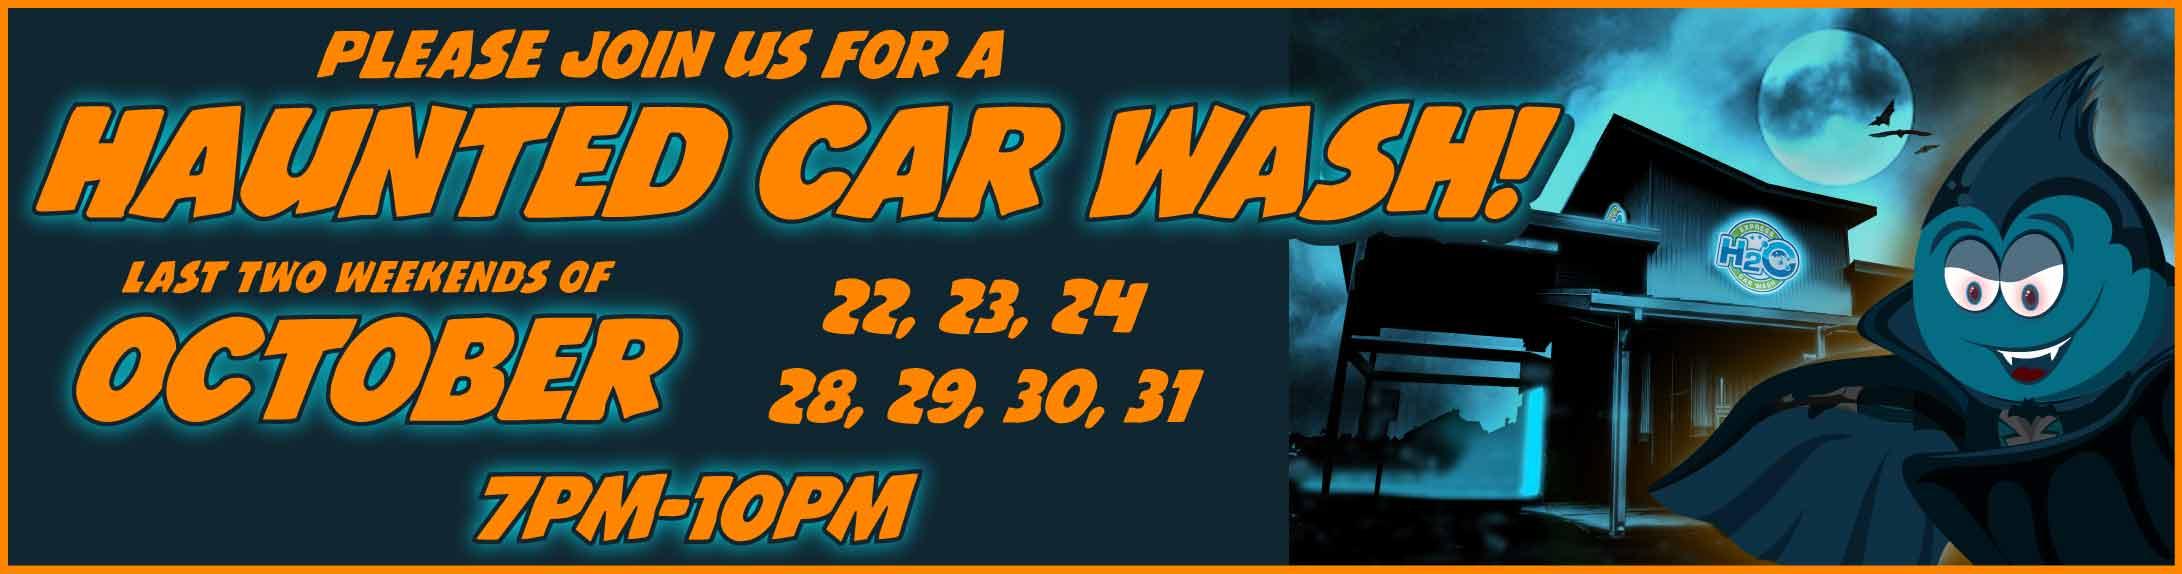 Halloween haunted car wash - H2O Express Car Wash